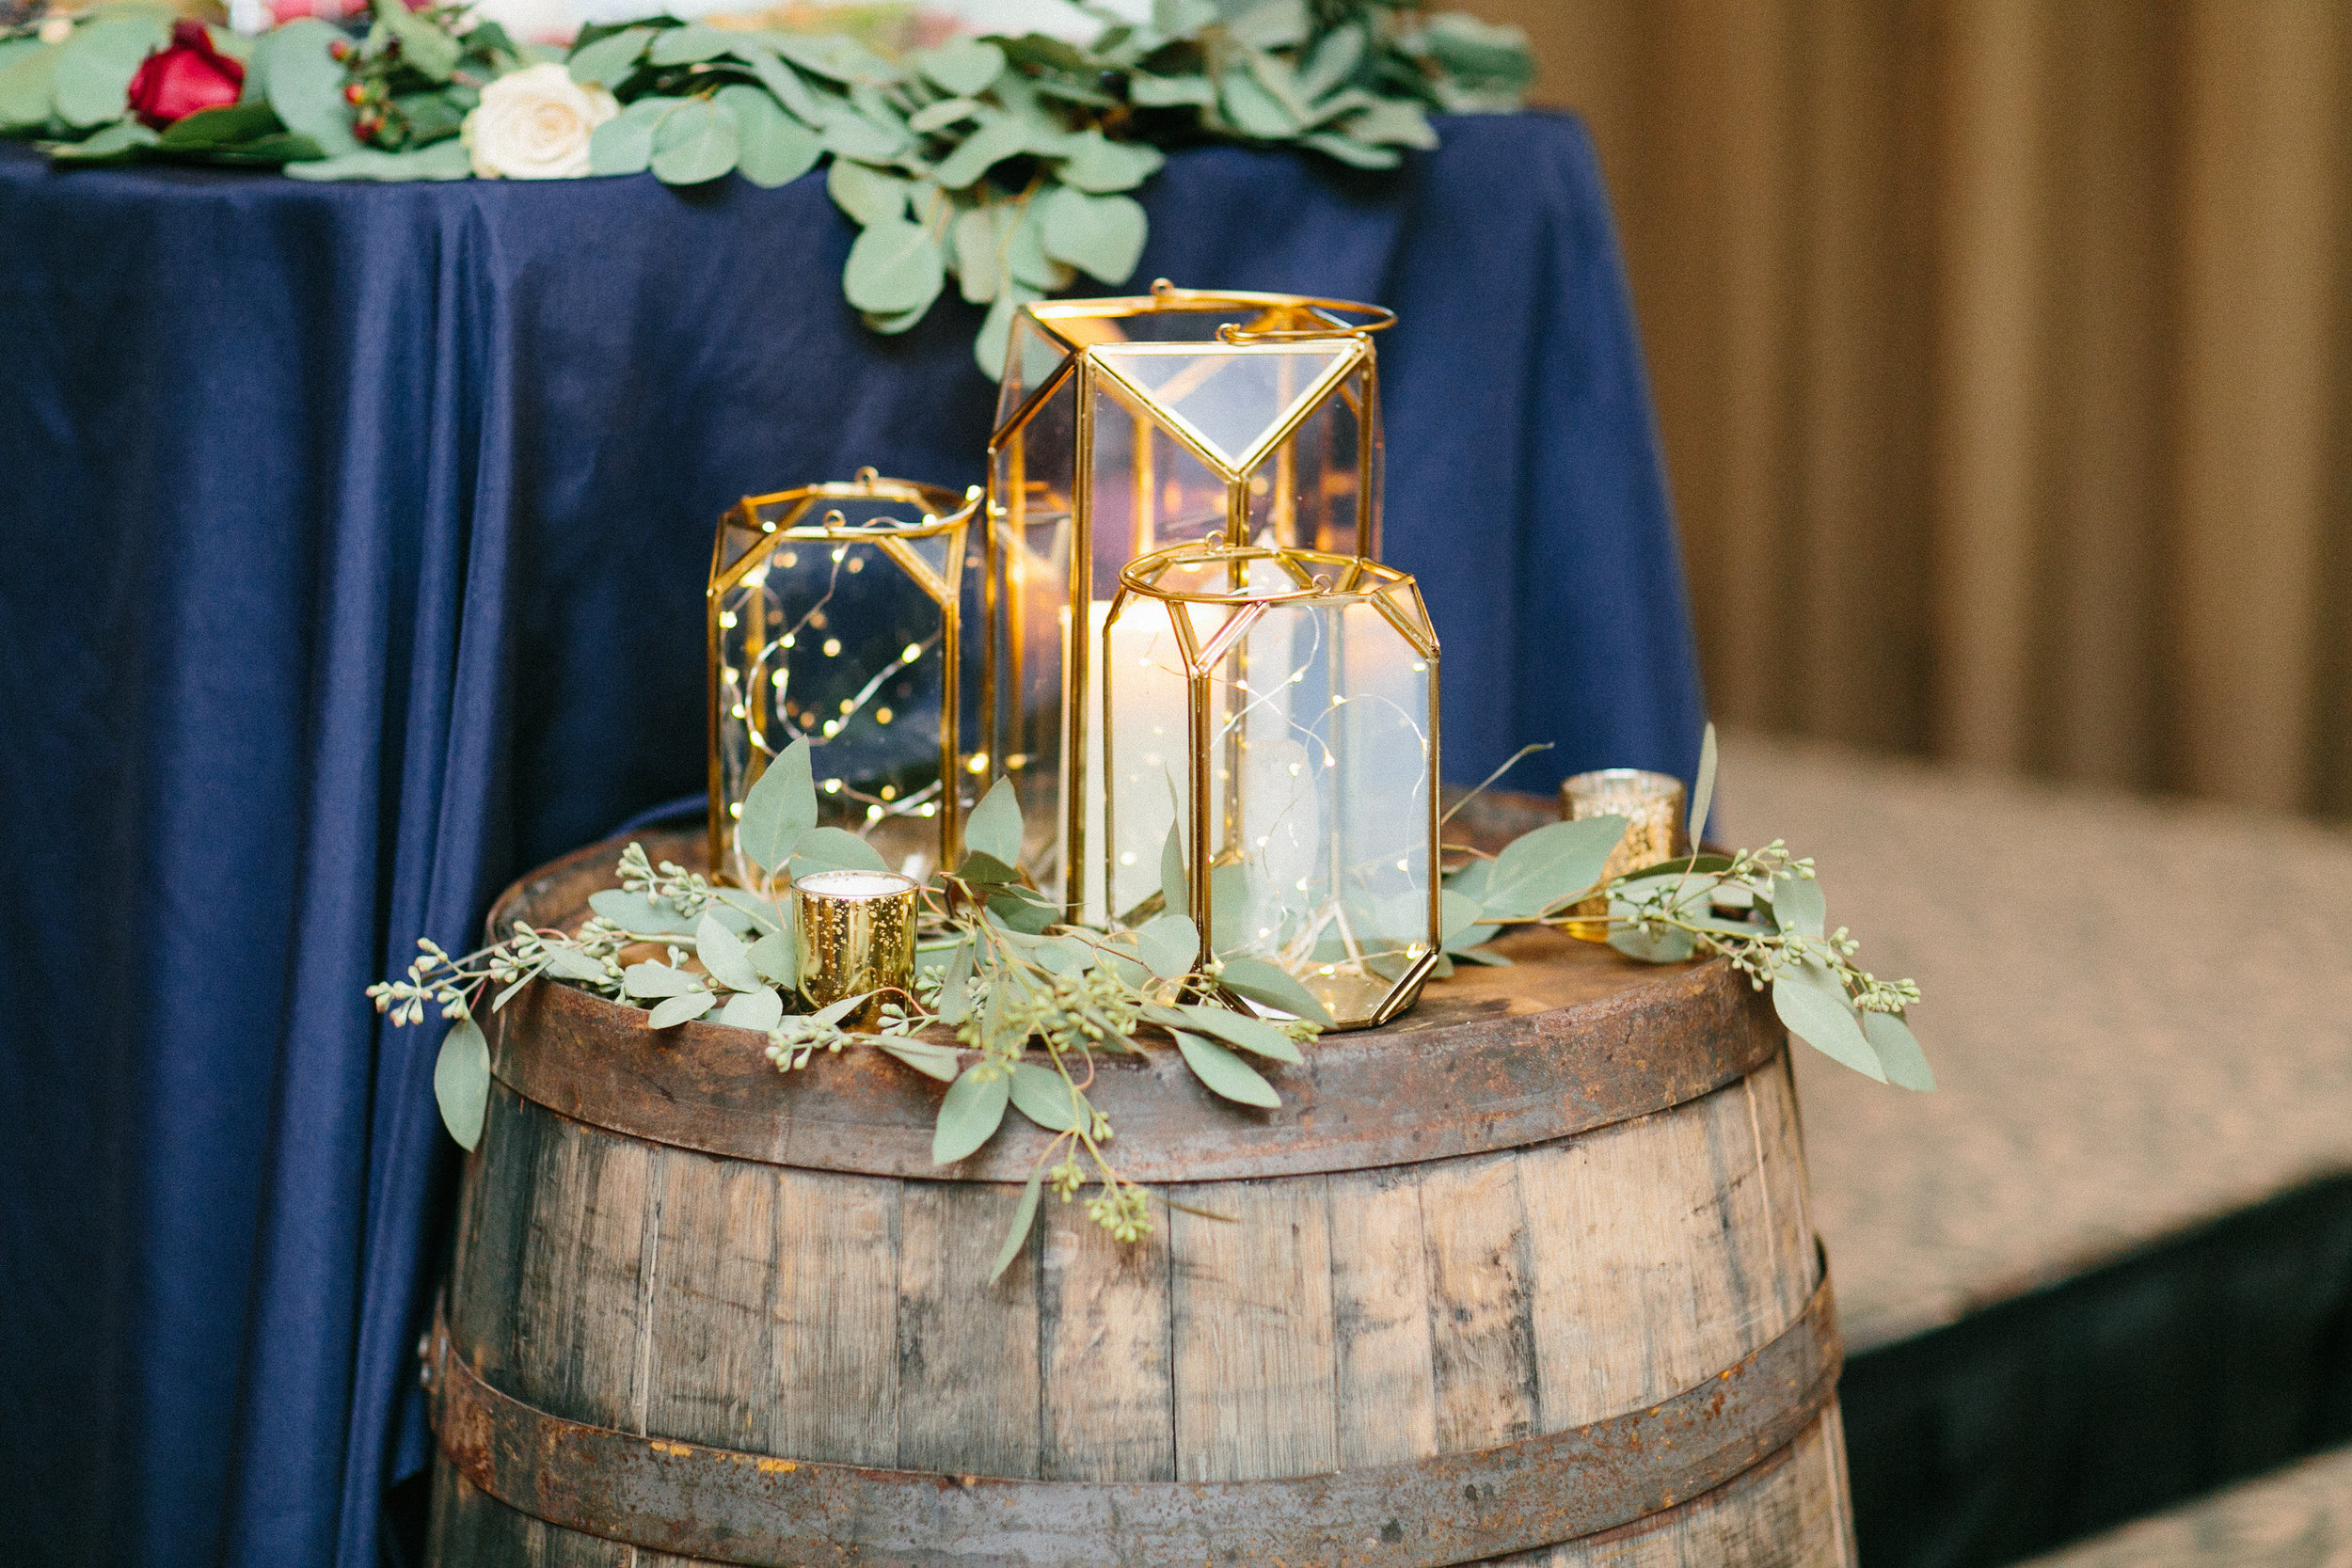 2017_Carly_Milbrath_Jefferson_Street_Inn_Wedding_Wausau_WI_425.JPG